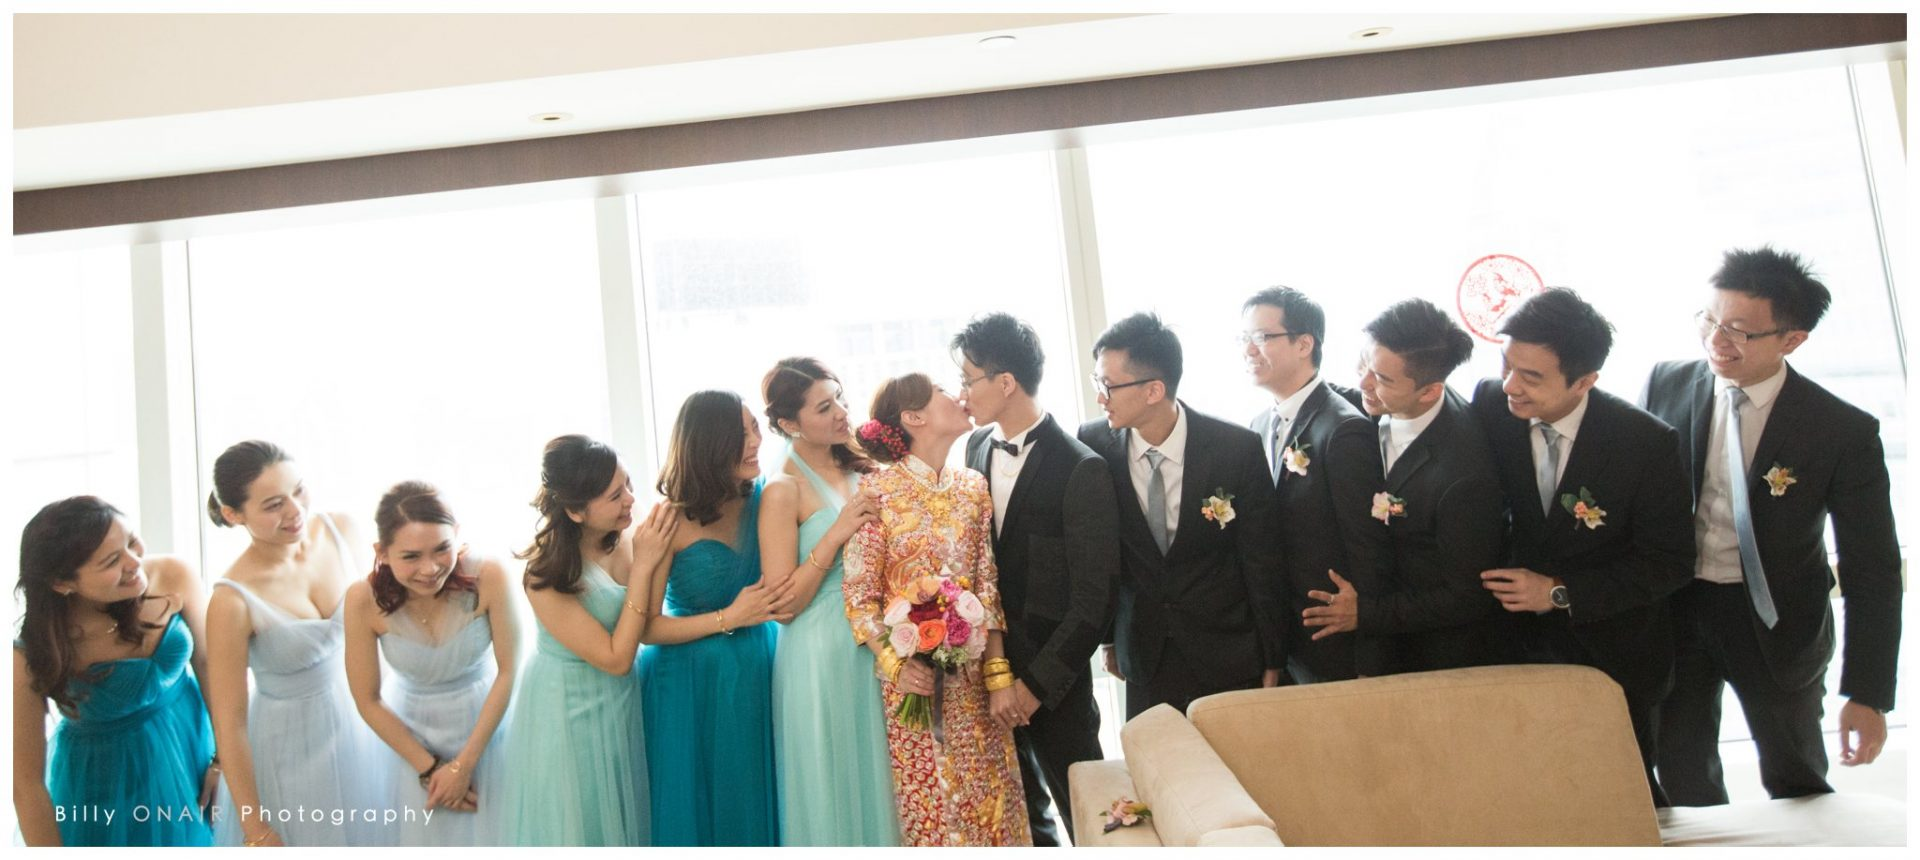 billy_wedding_photography_016